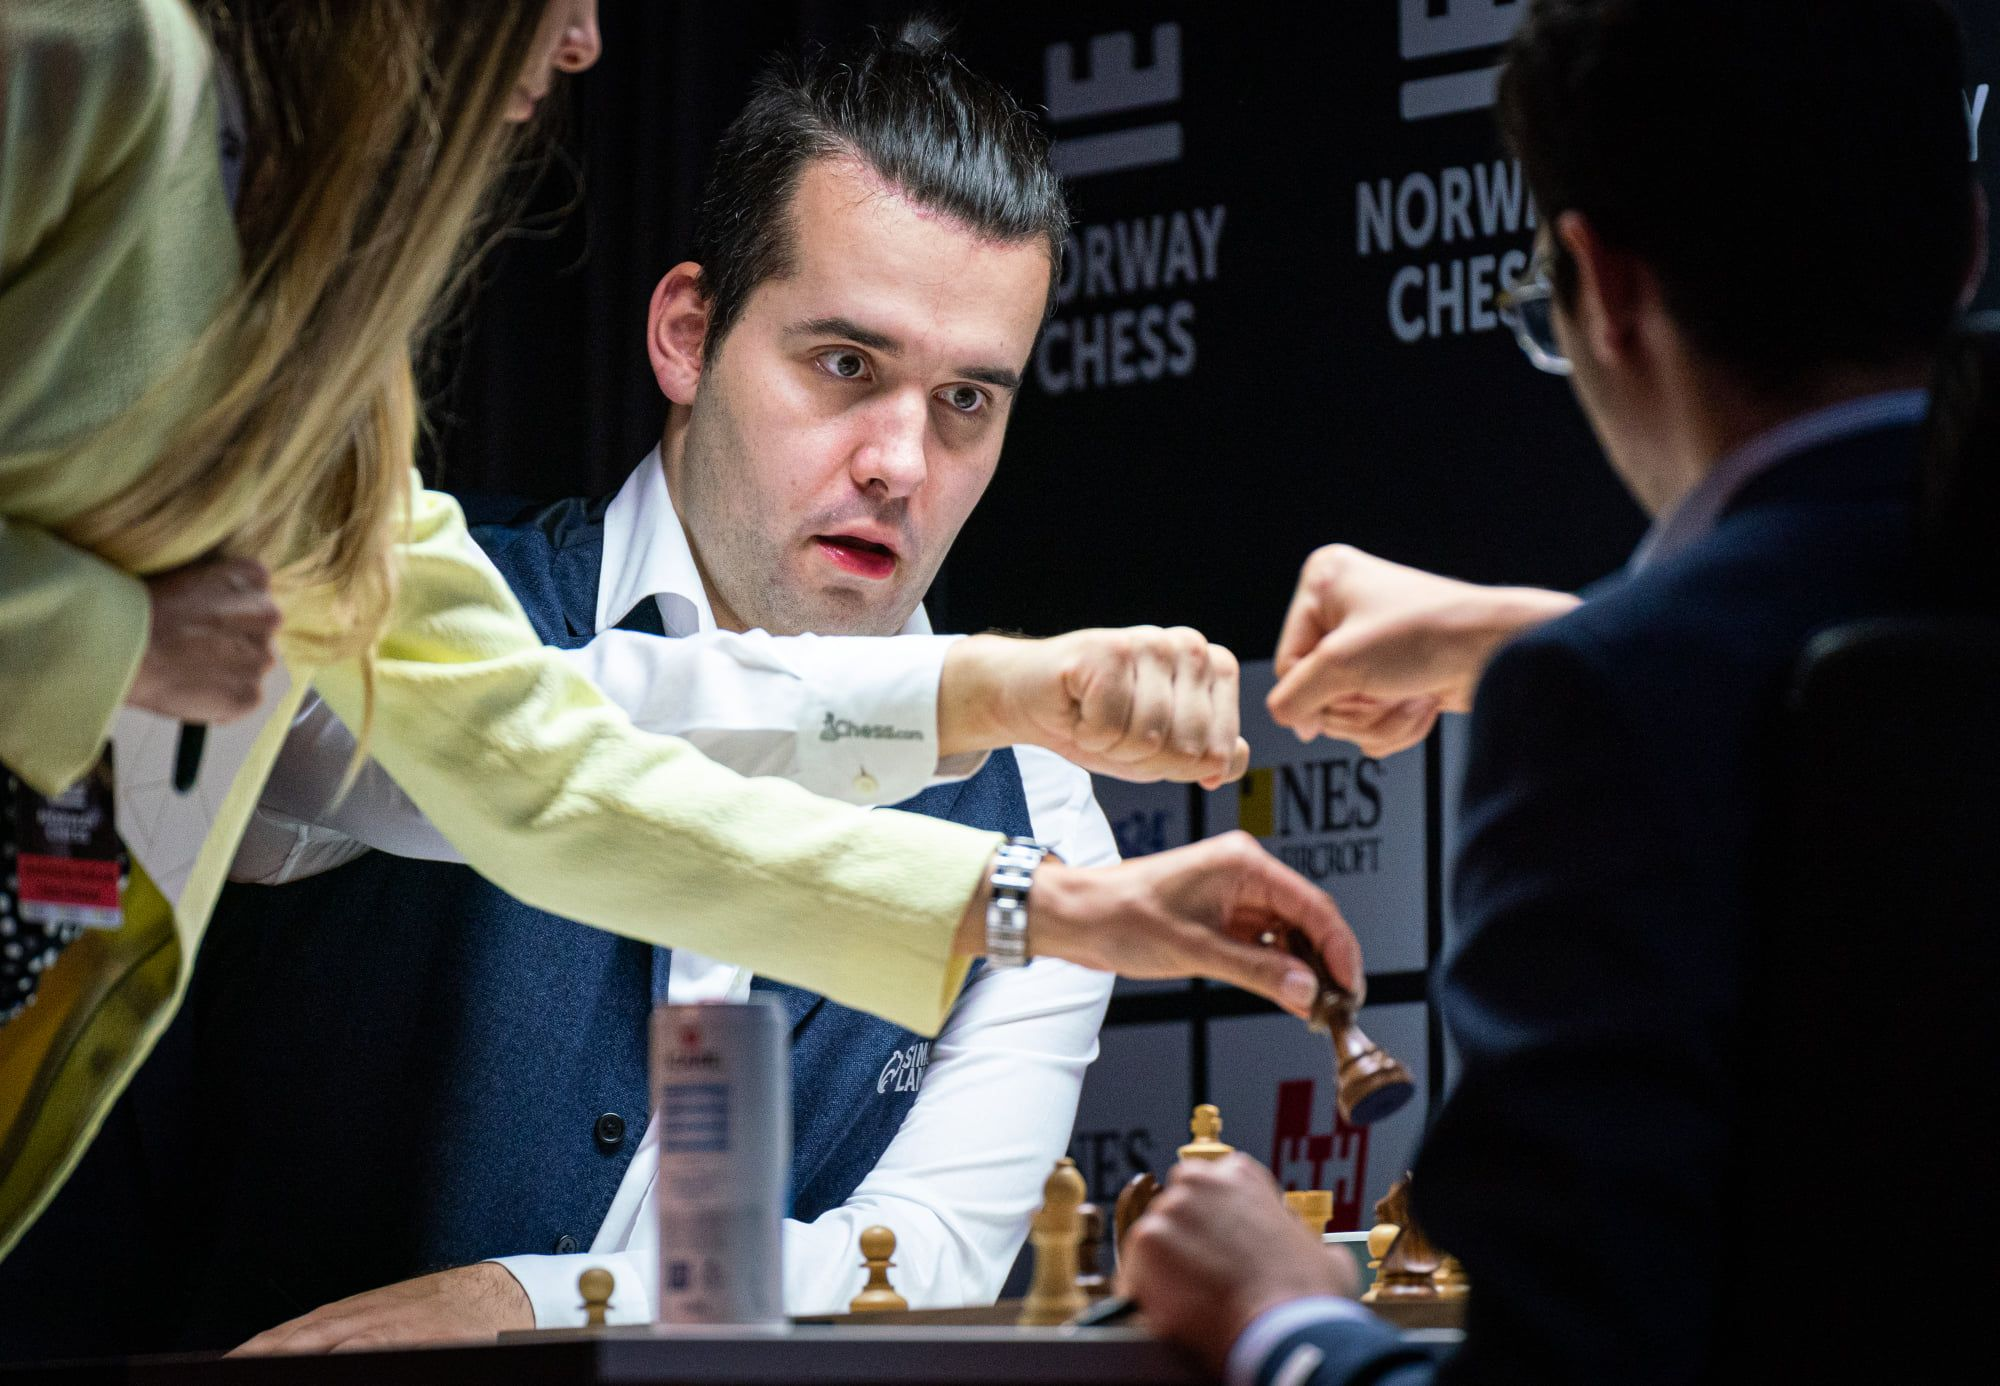 Nepomniachtchi Firouzja armageddon 2021 Norway Chess